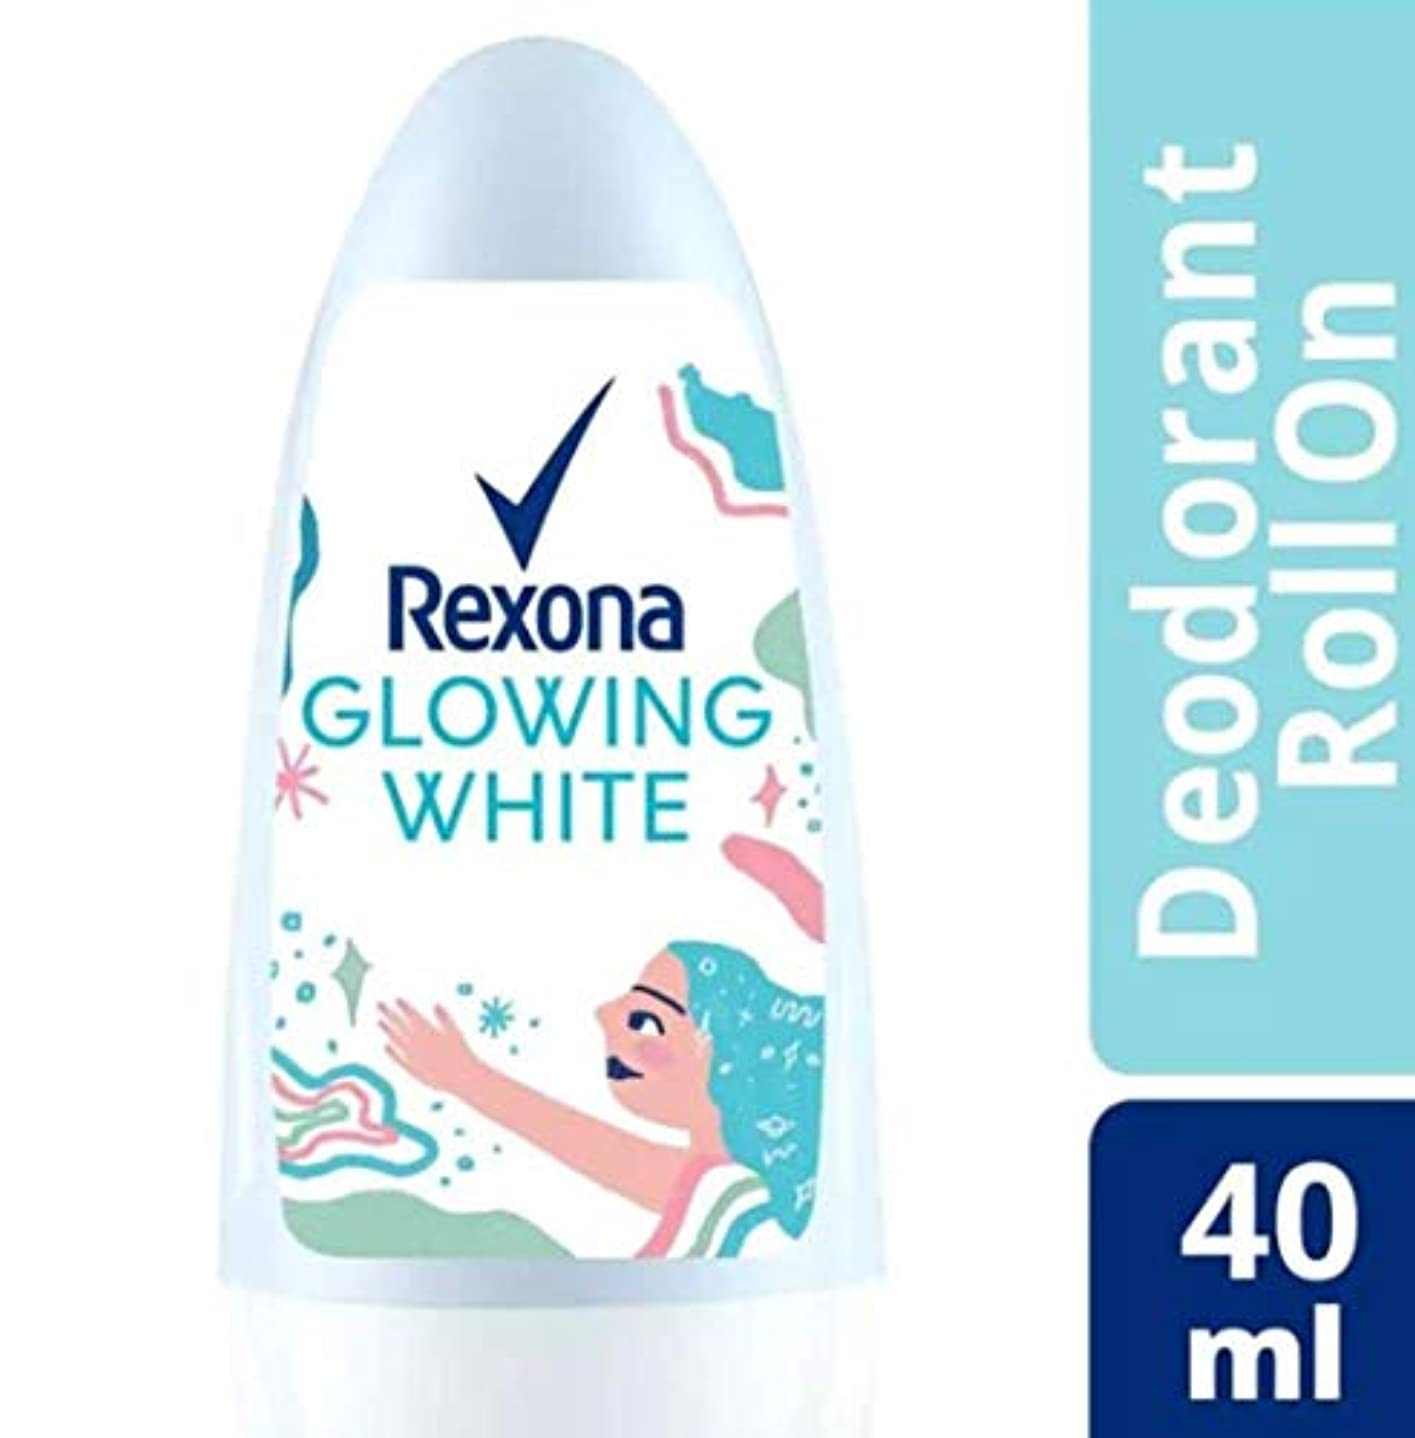 Rexona レクソナ woman 制汗 デオドラント ロールオン GROWING WHITE【アルコール 0%】 ソフトなバラの香り 40ml [並行輸入品]